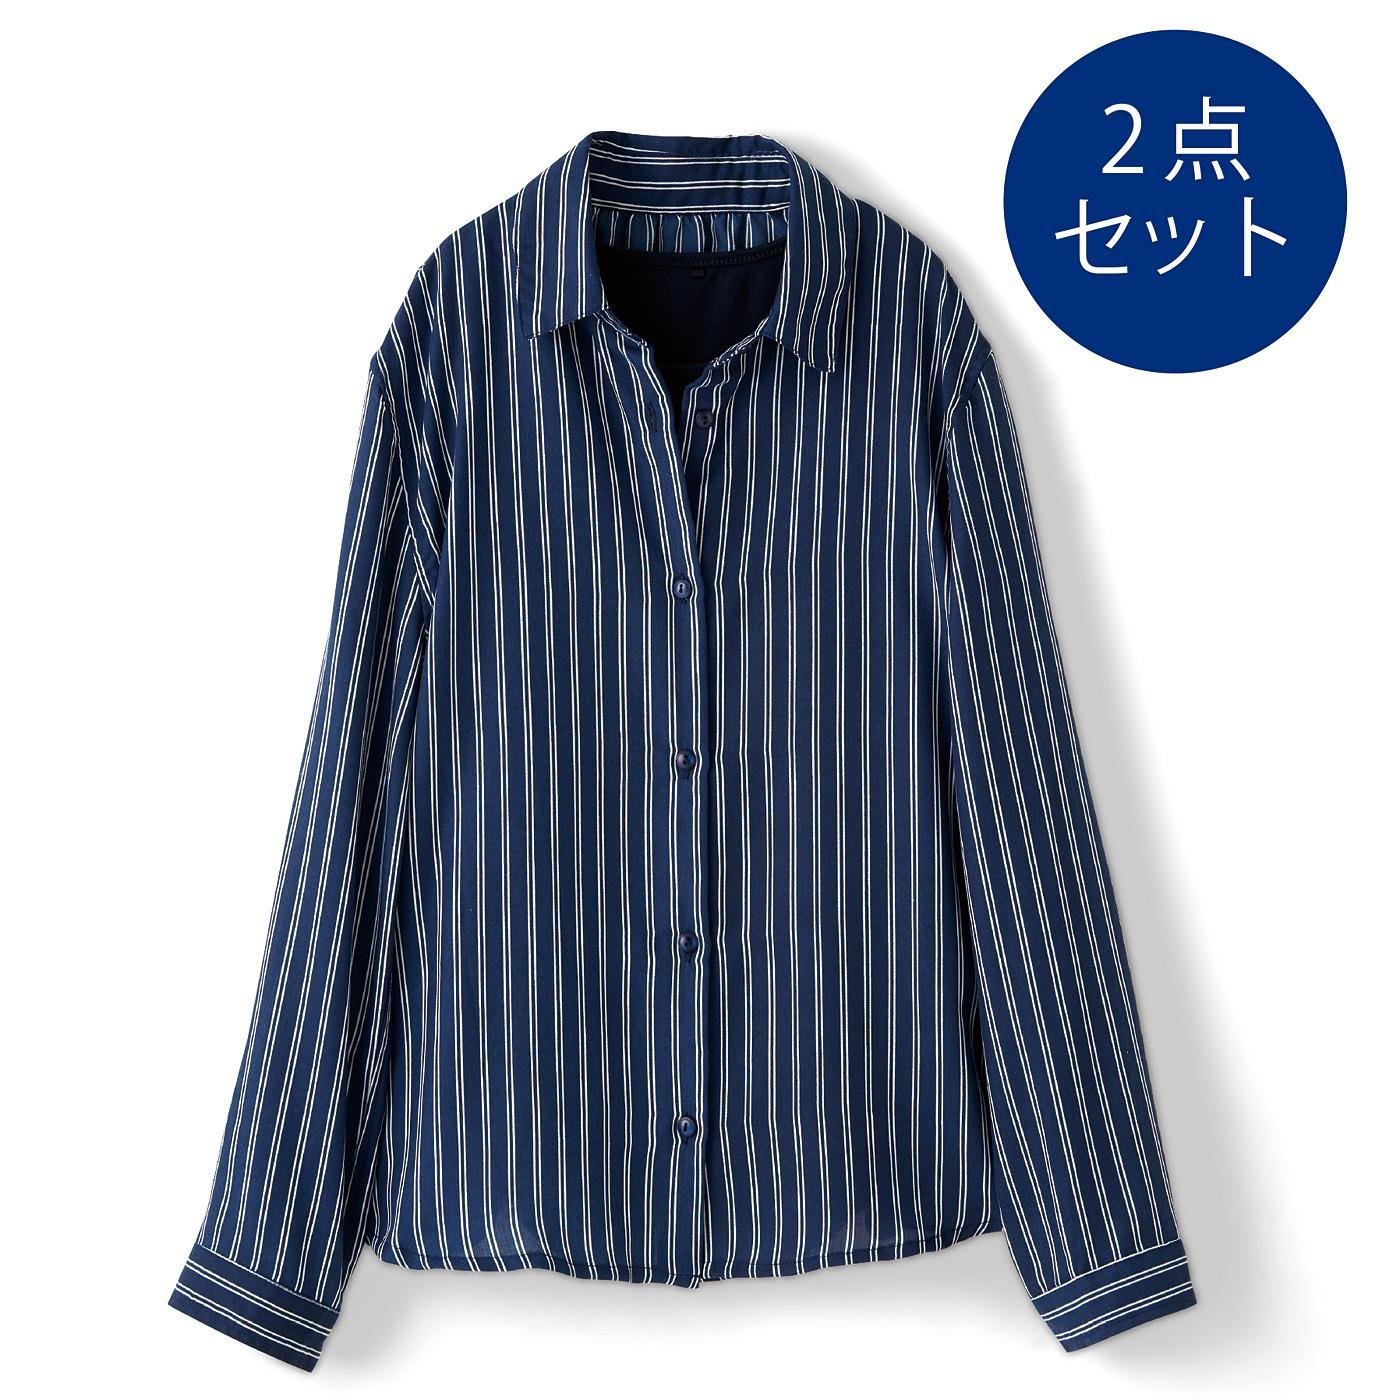 DRECOバイヤーズセレクト ストライプシャツとTシャツのセット〈ネイビー〉